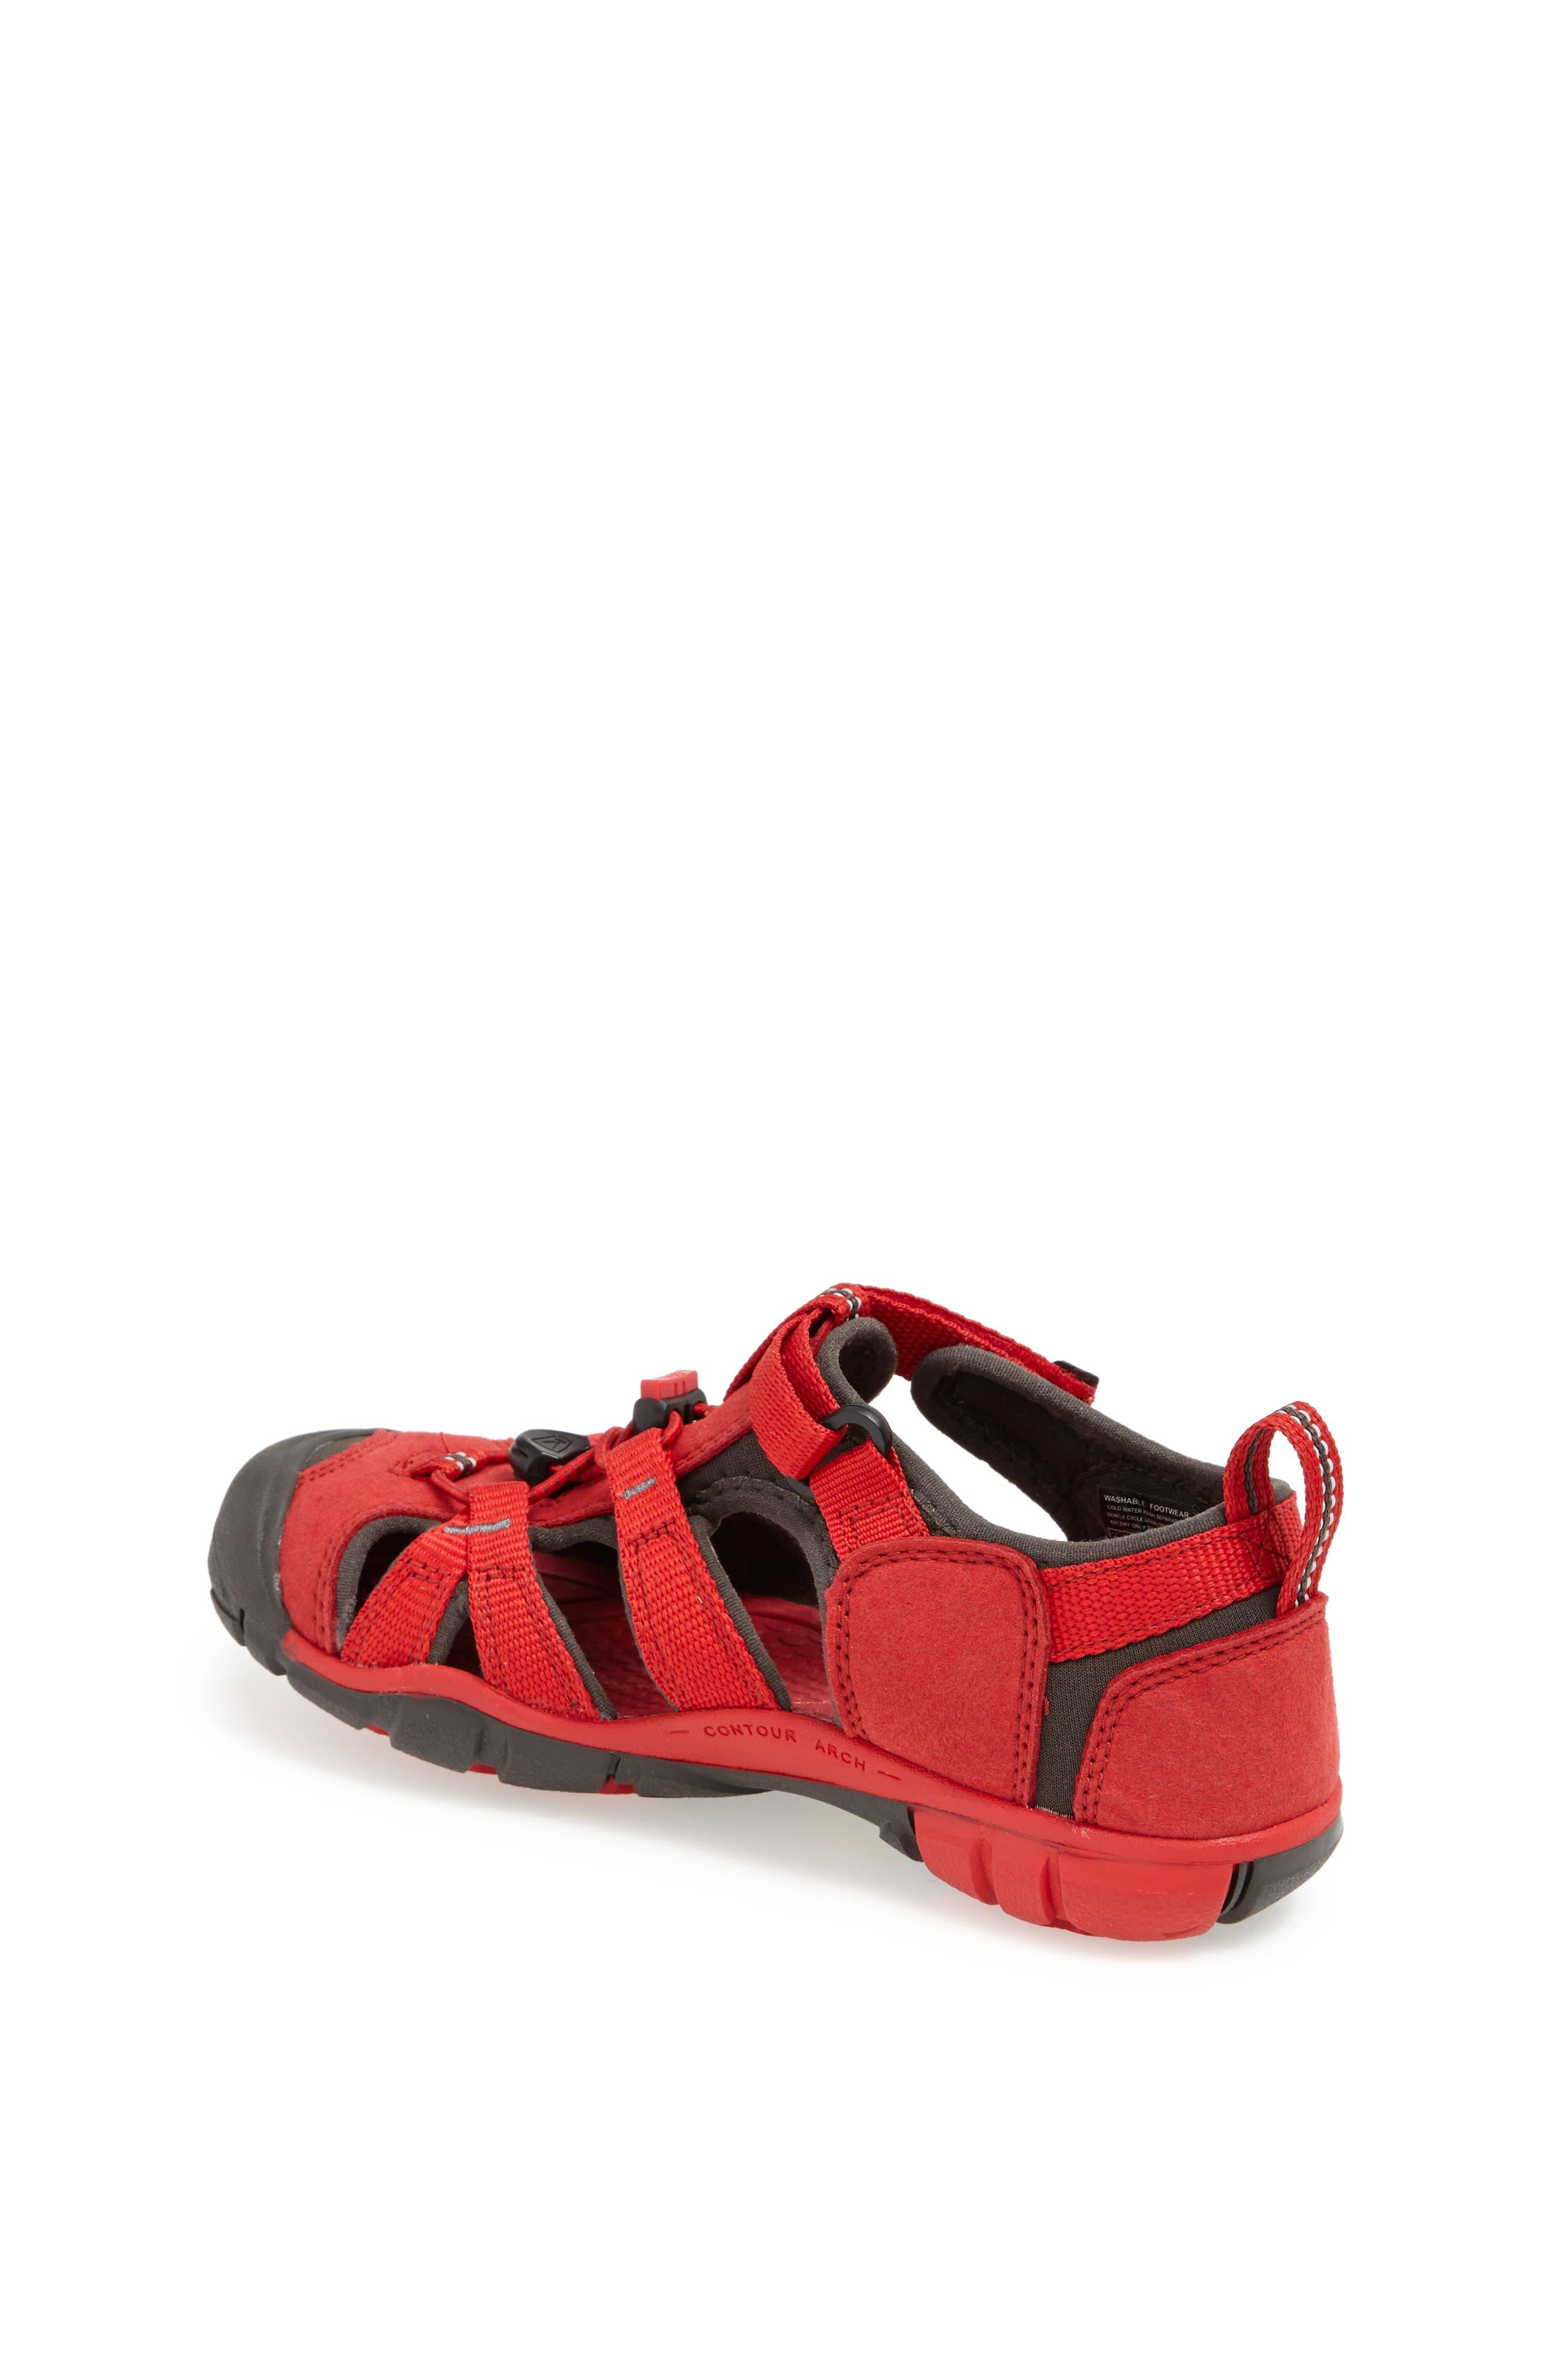 ,                             'Seacamp II' Water Friendly Sandal,                             Alternate thumbnail 239, color,                             604